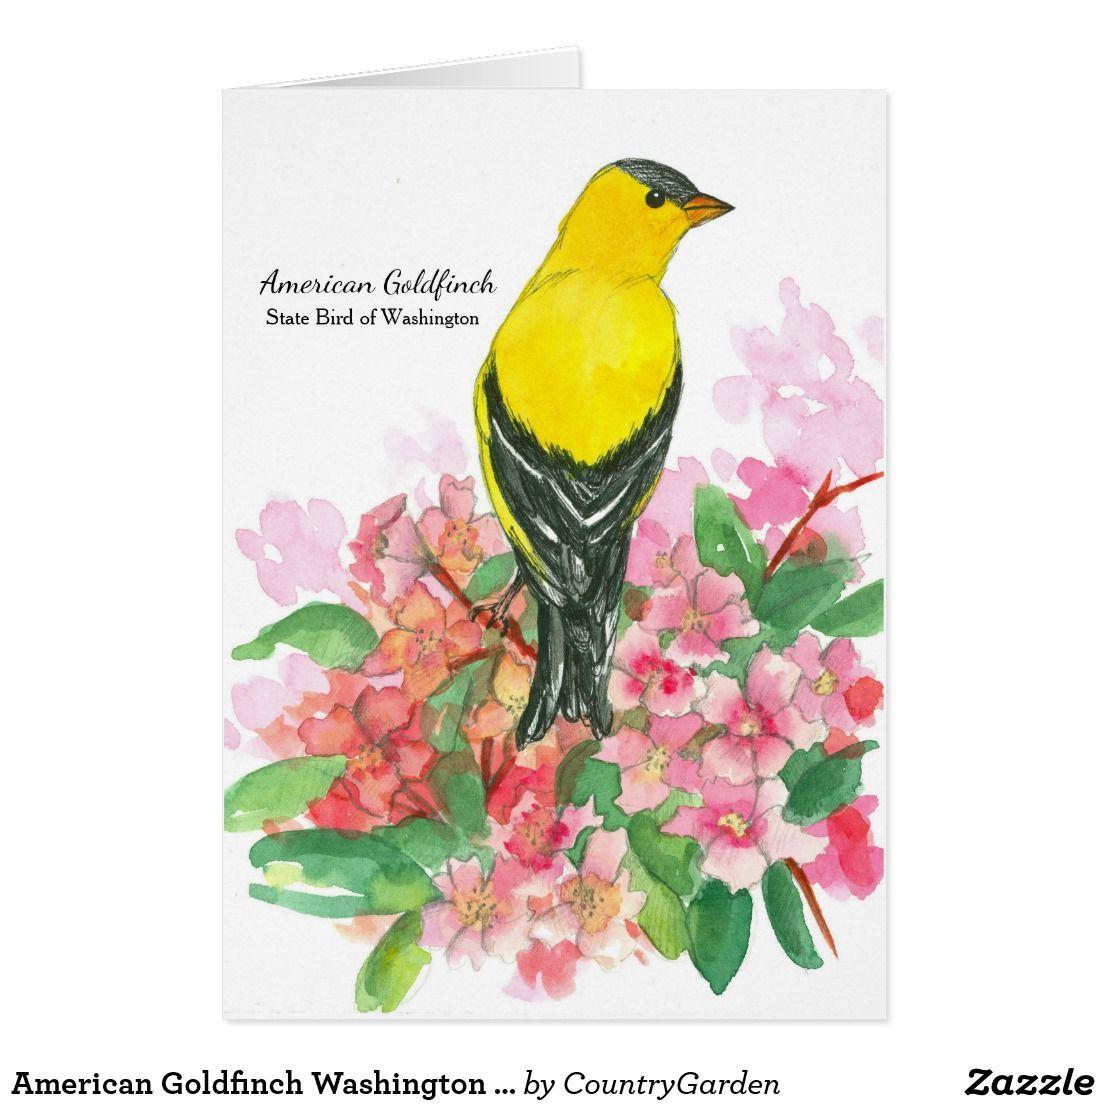 American Goldfinch Washington State Bird Blank